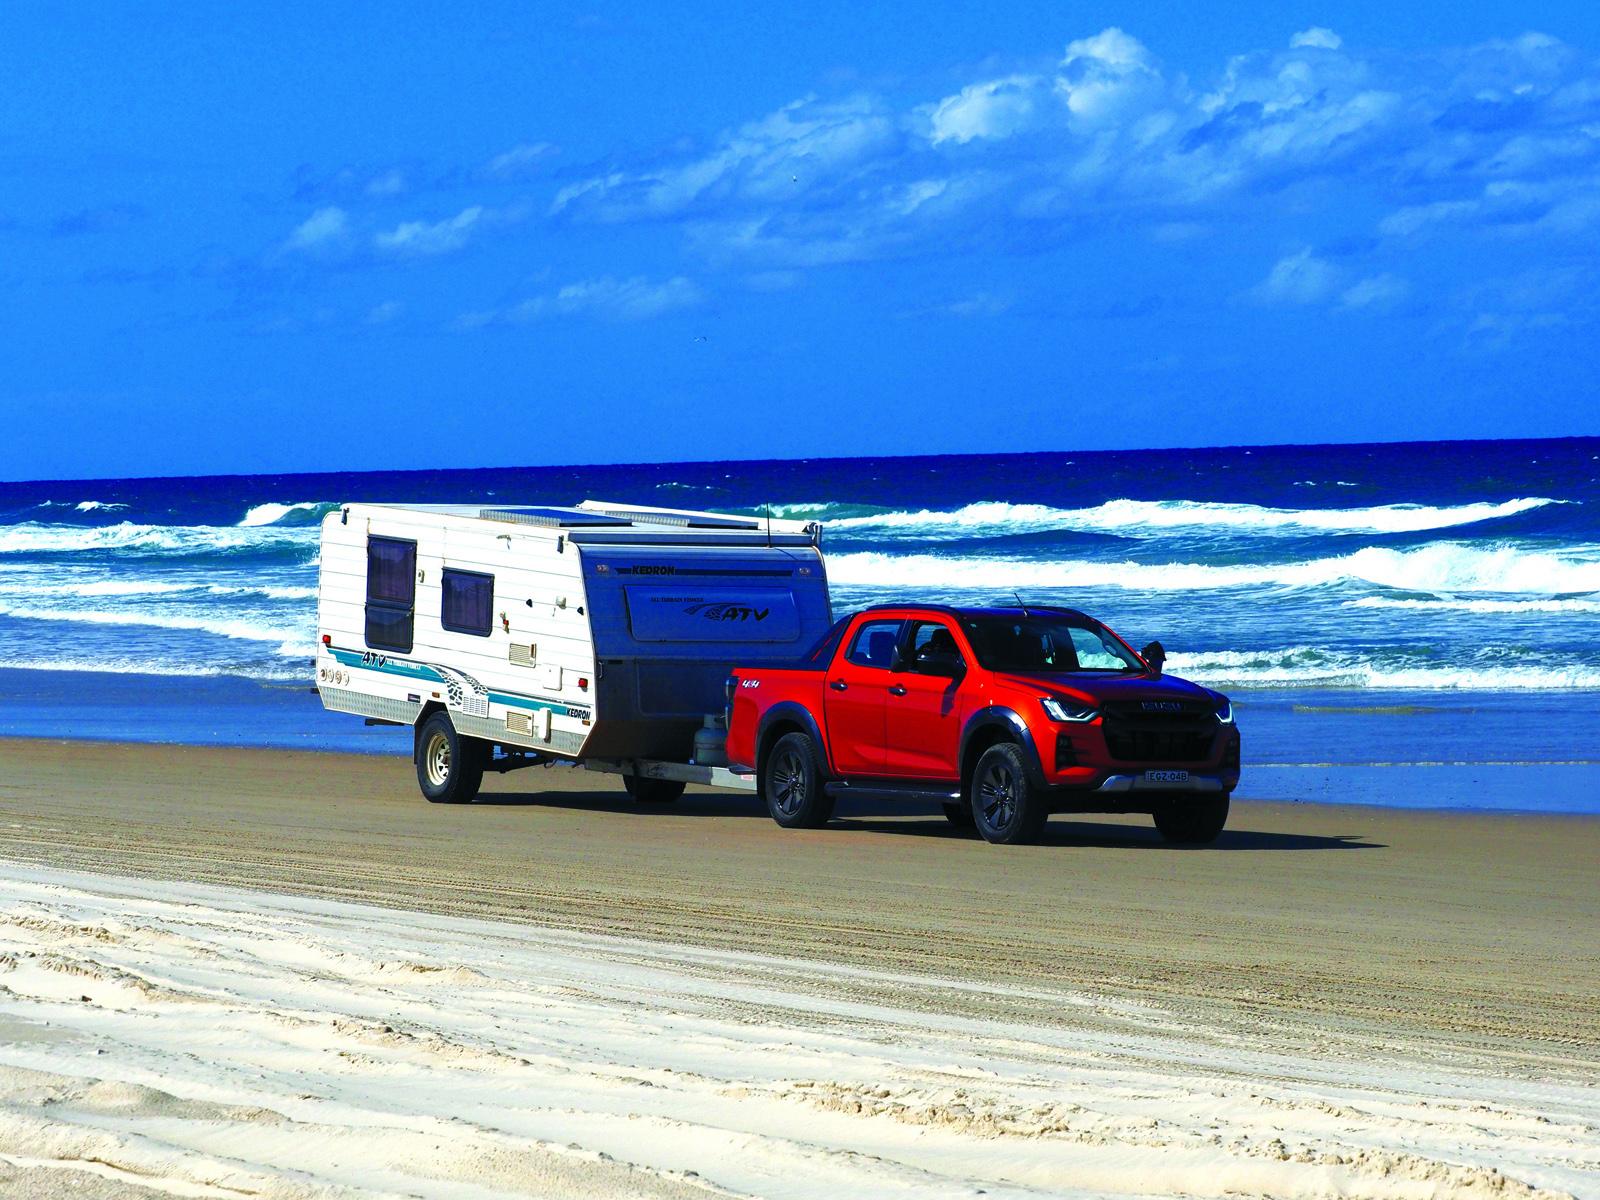 Isuzu towing a caravan